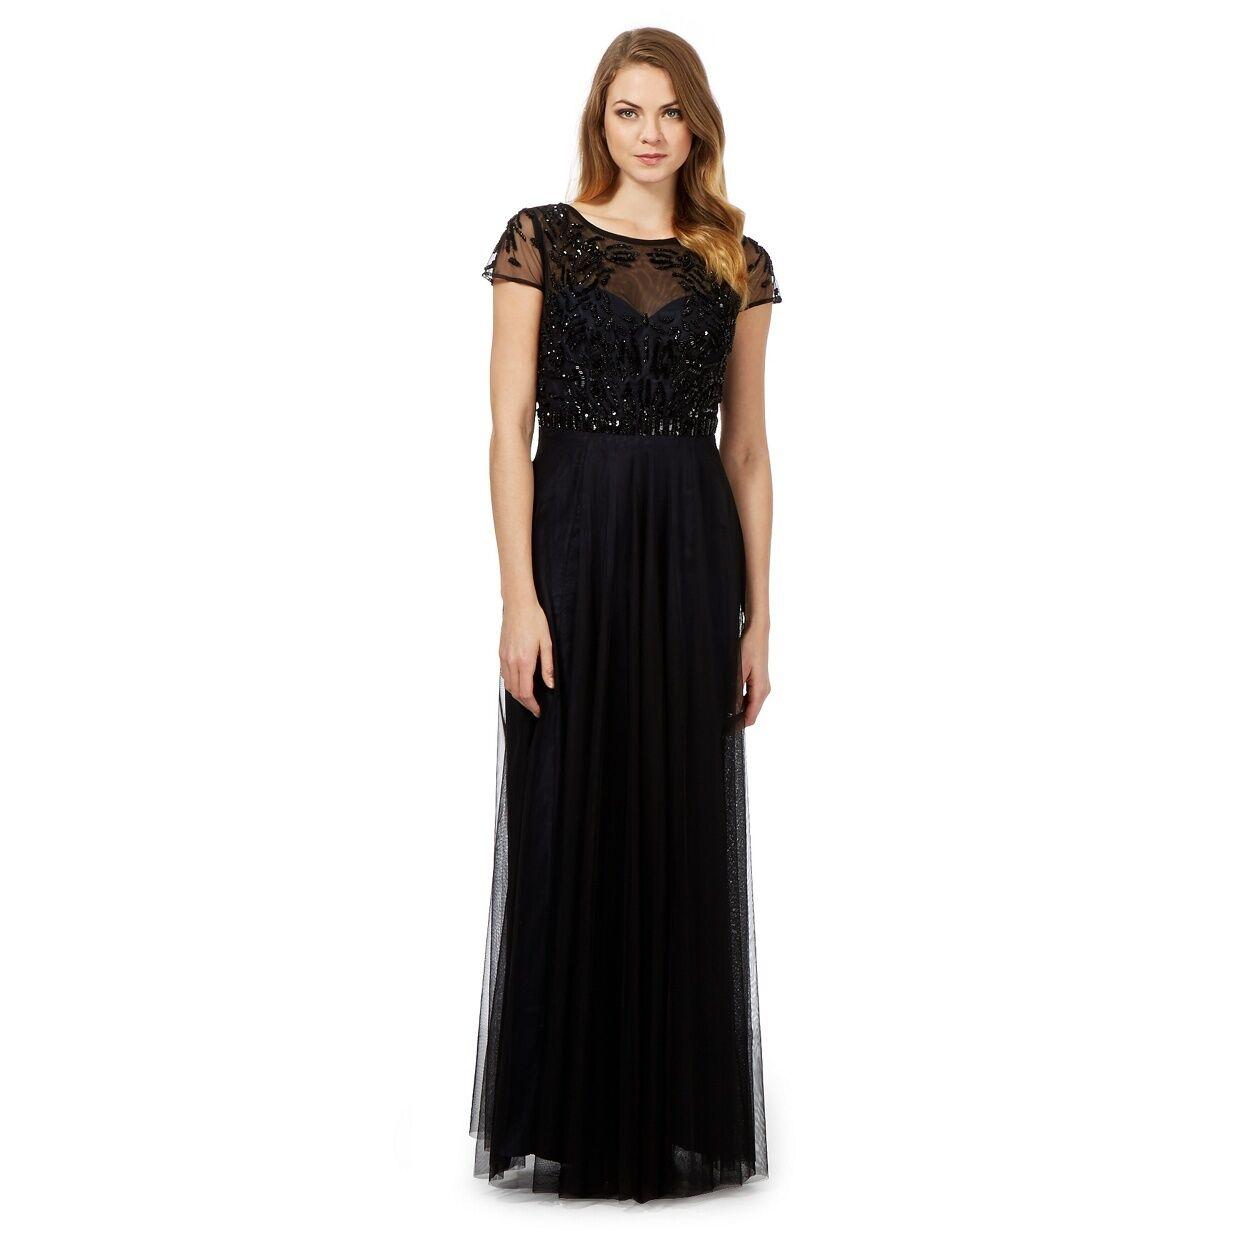 BNWT Debenhams DEBUT schwarz OPERETTA Embellished Maxi Dress Größe 14-RRP